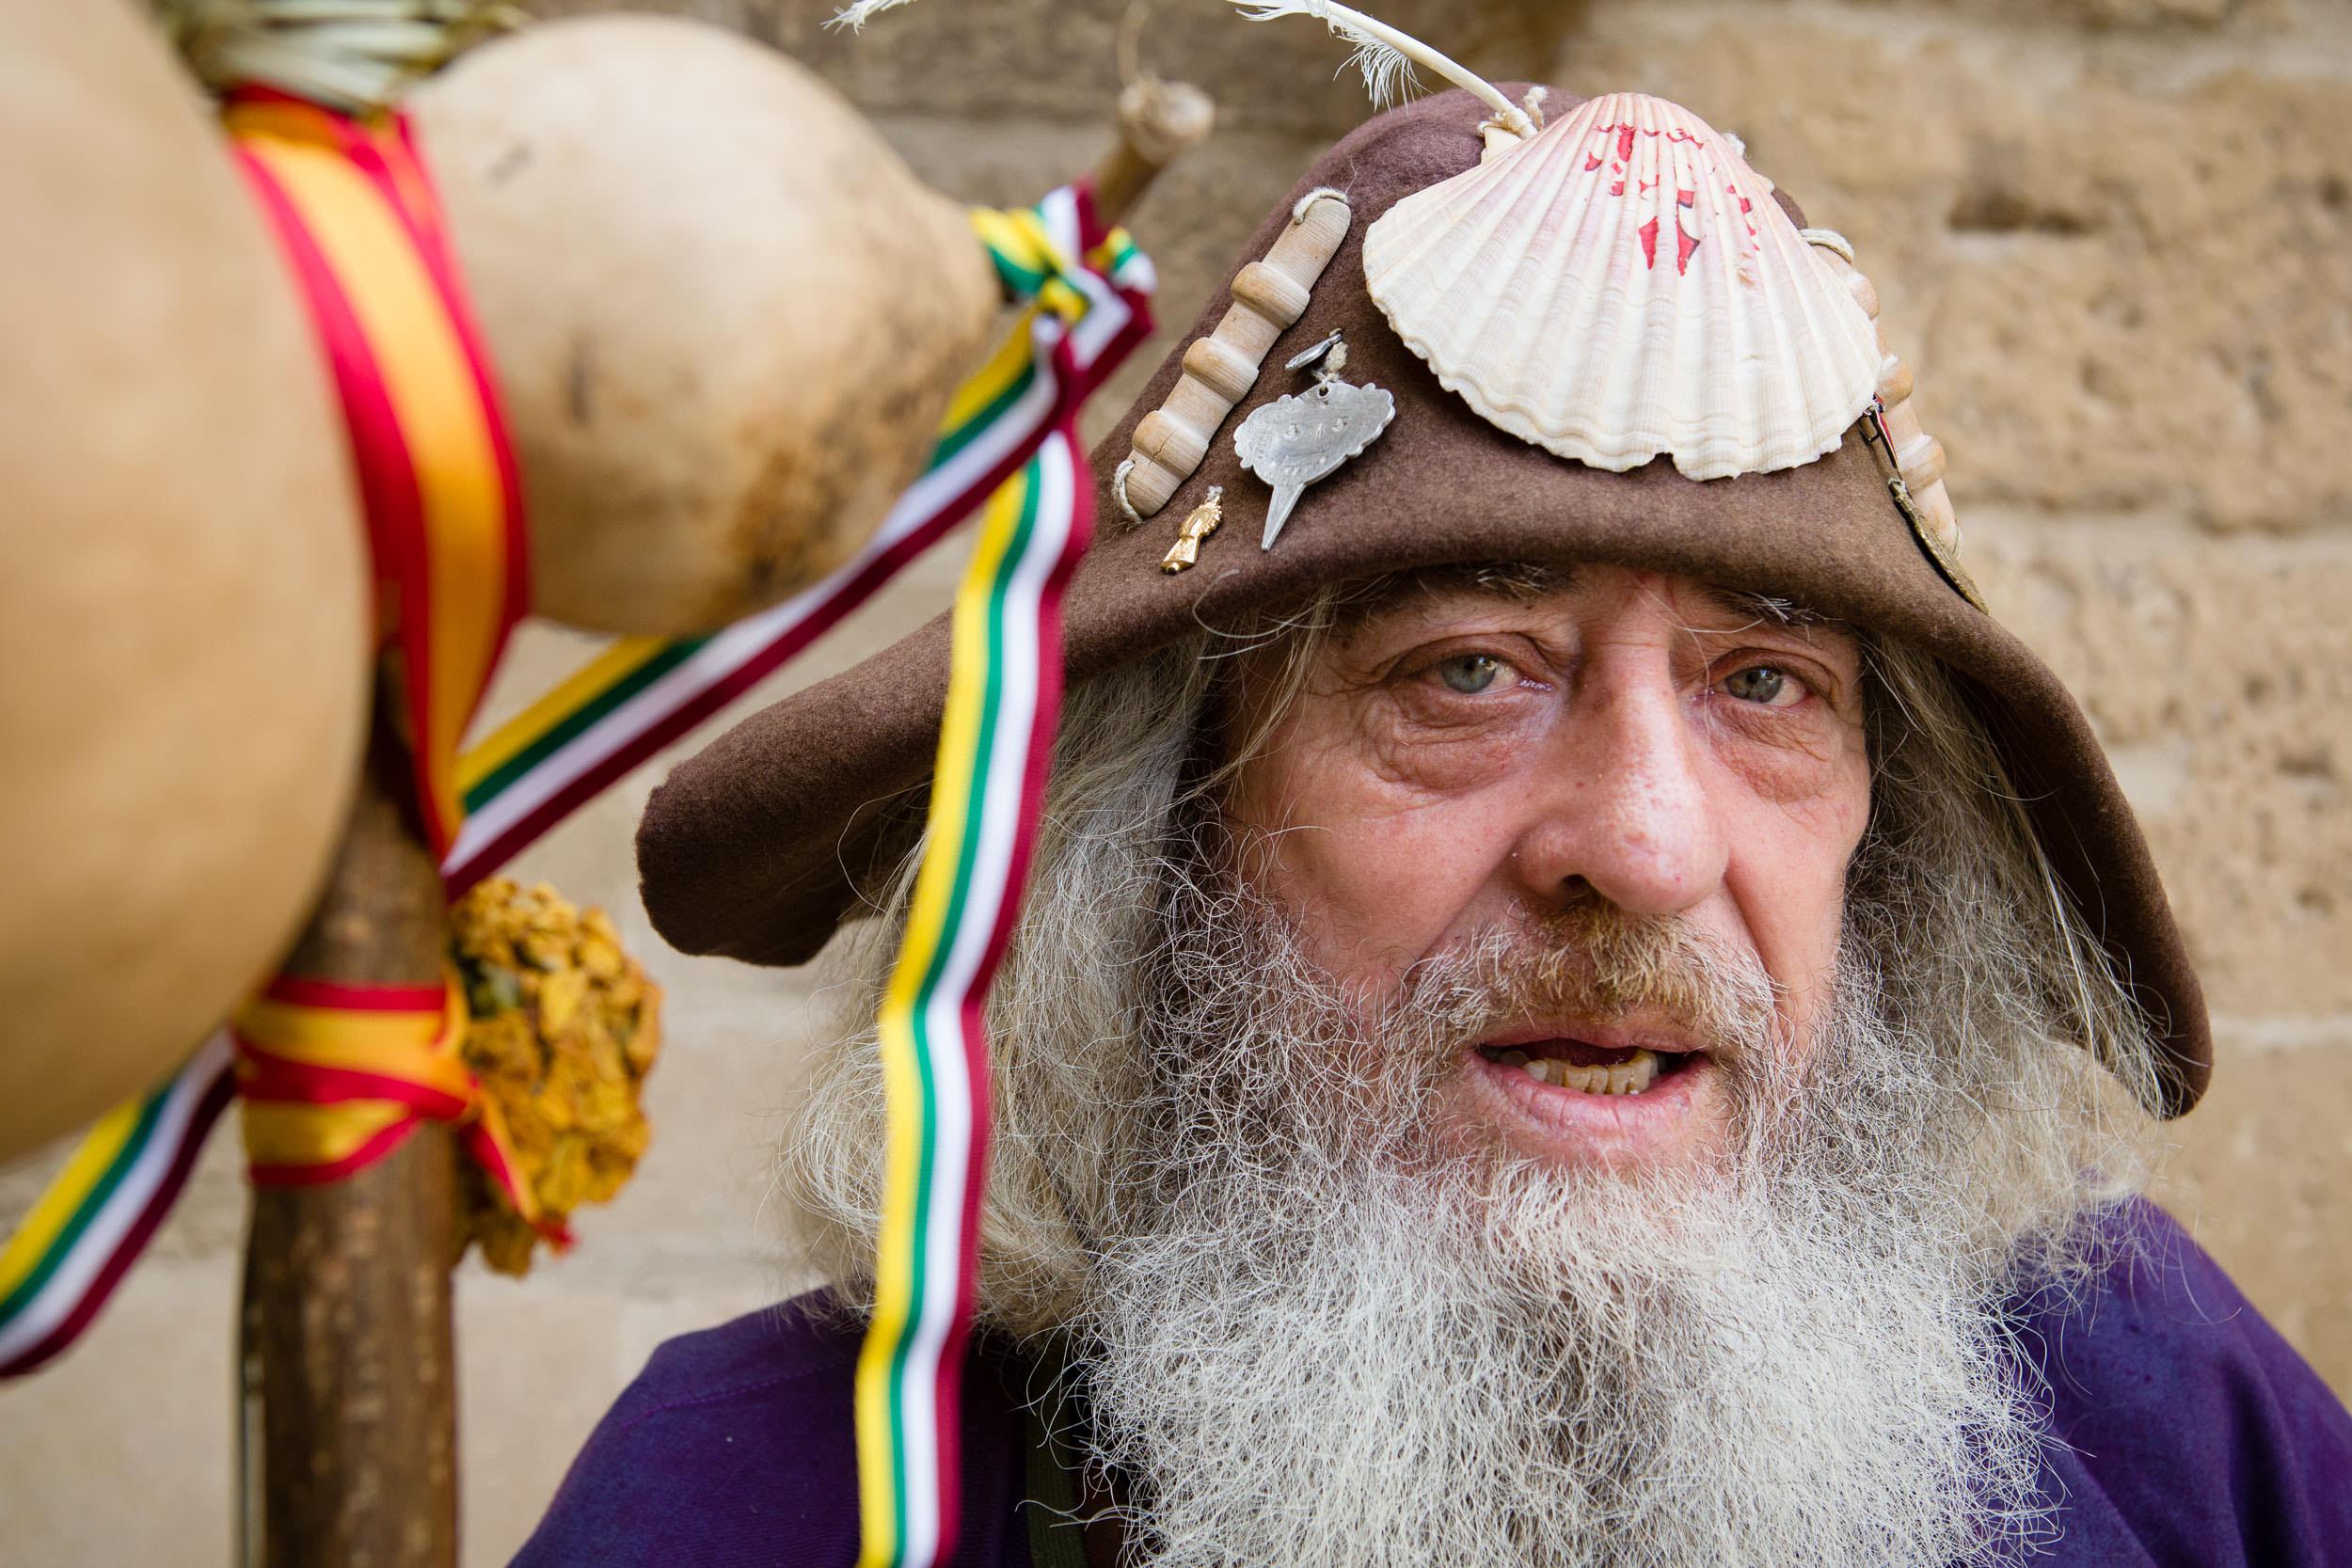 Portrait Photography in La Rioja Basque Country Spain - James Sturcke - sturcke.org_013.jpg